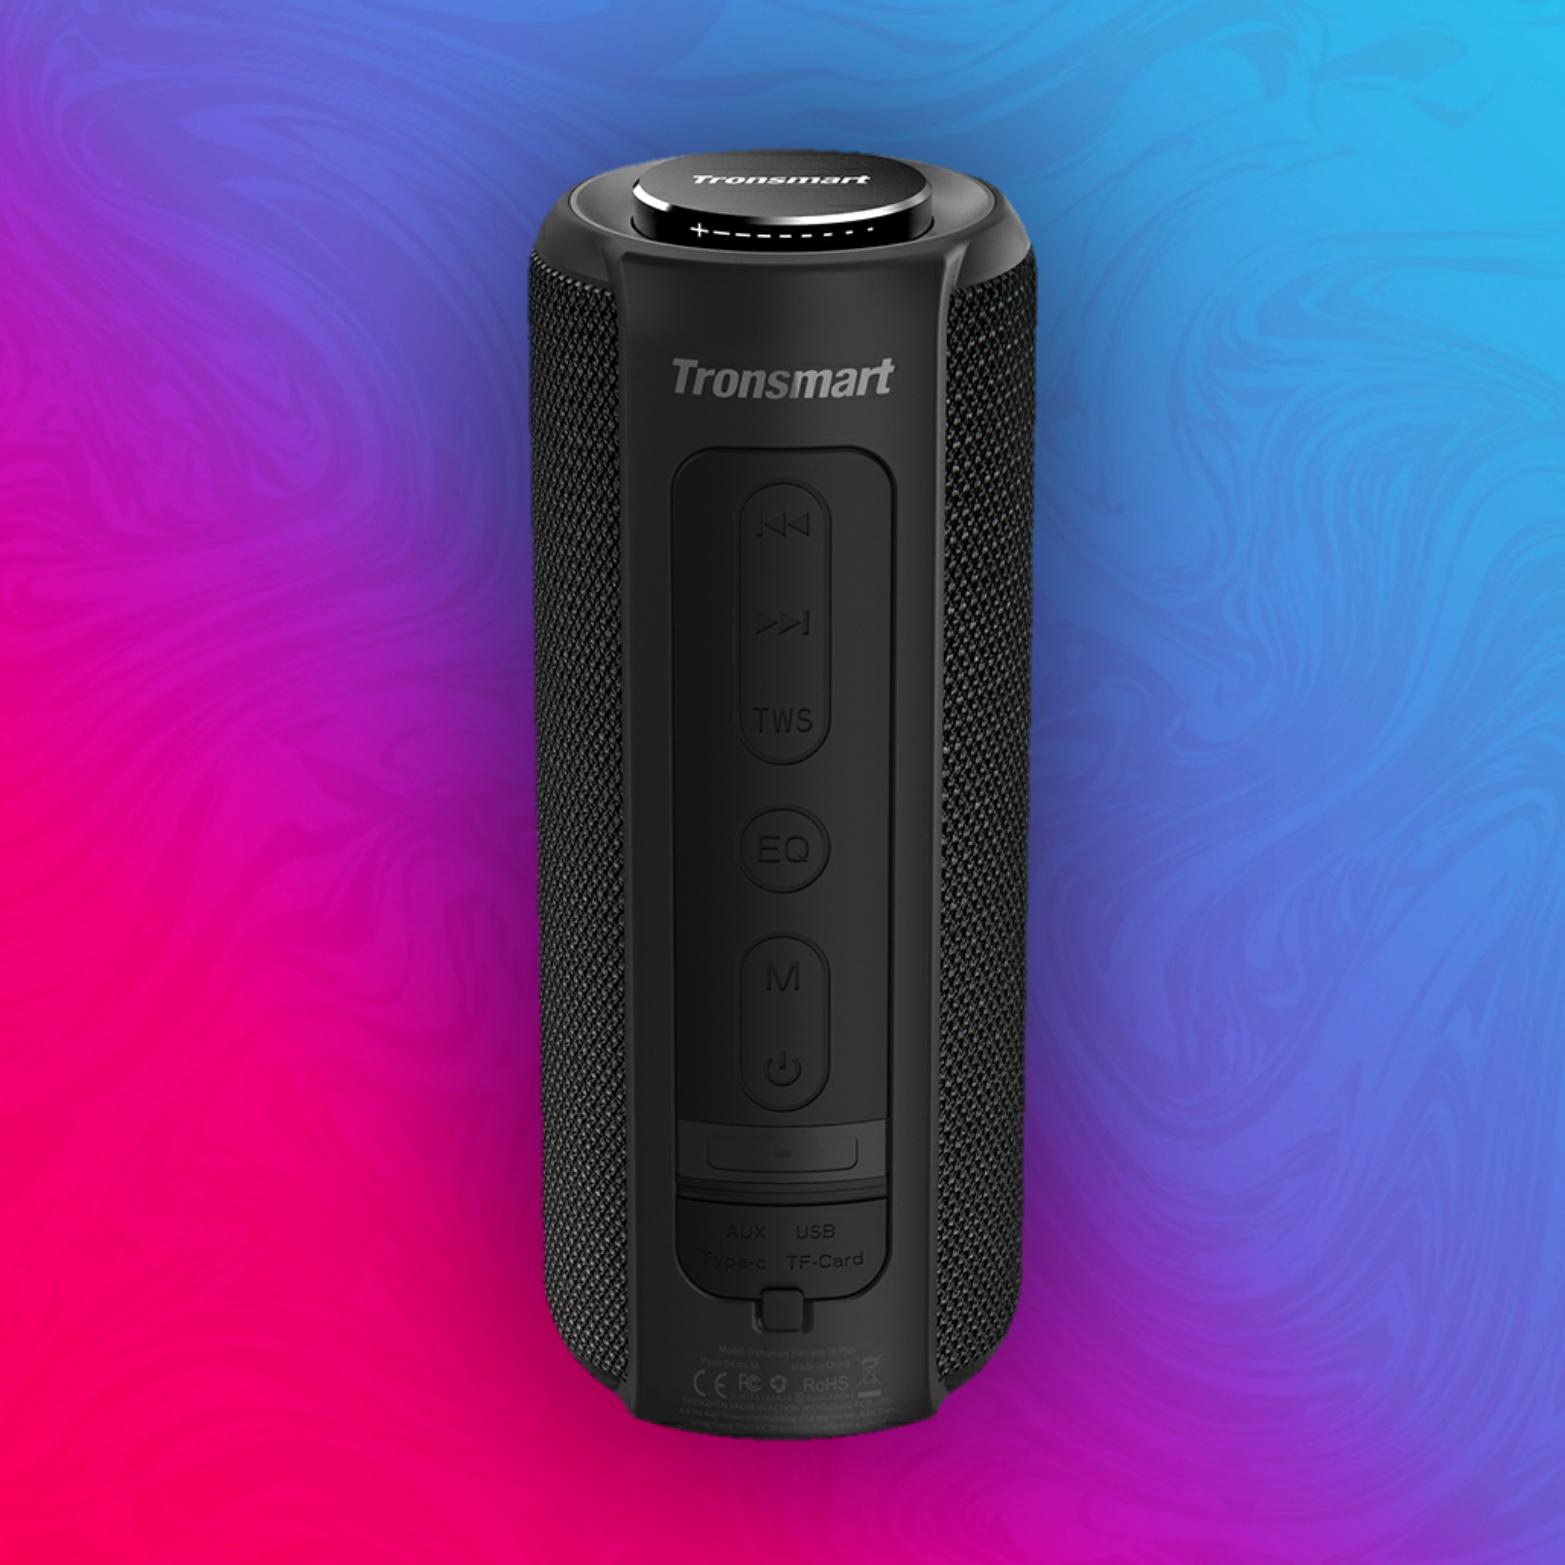 Tronsmart Element T6 Plus - 40W Lautsprecher - IPX6 Wasserdicht - 6600mAh Akku - A2DP, ACRCP, HFP